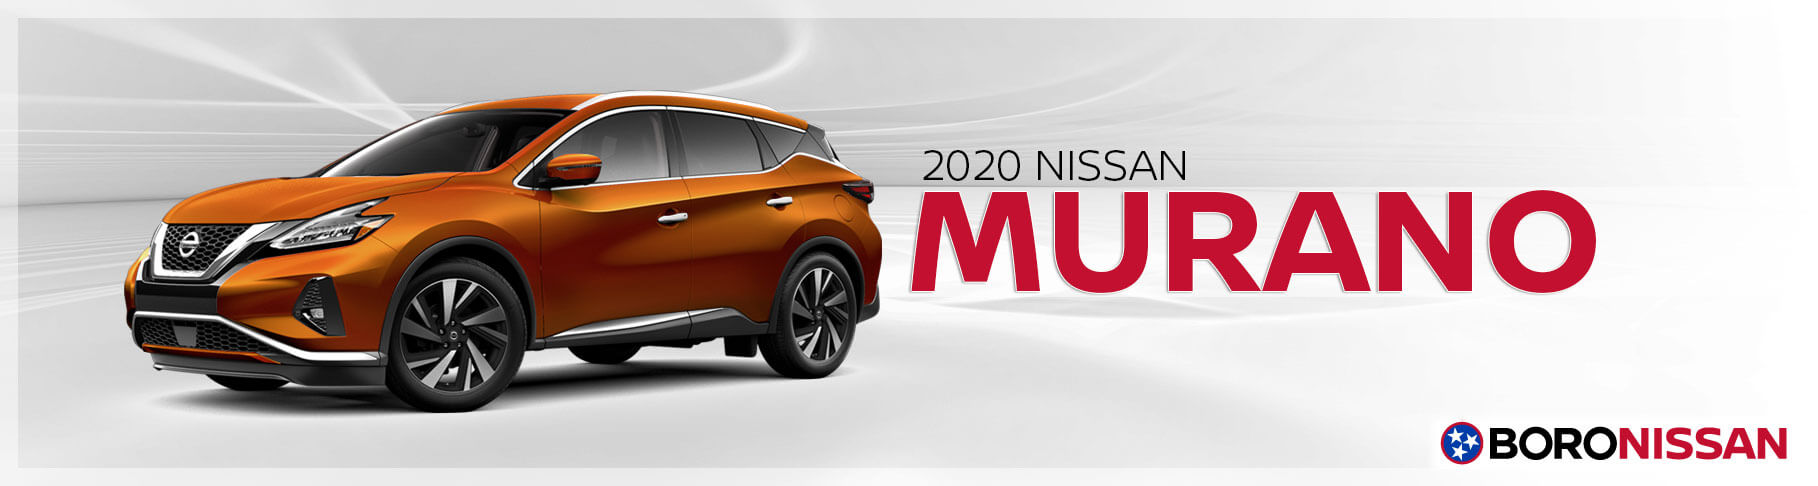 The New 2020 Nissan Murano SUV